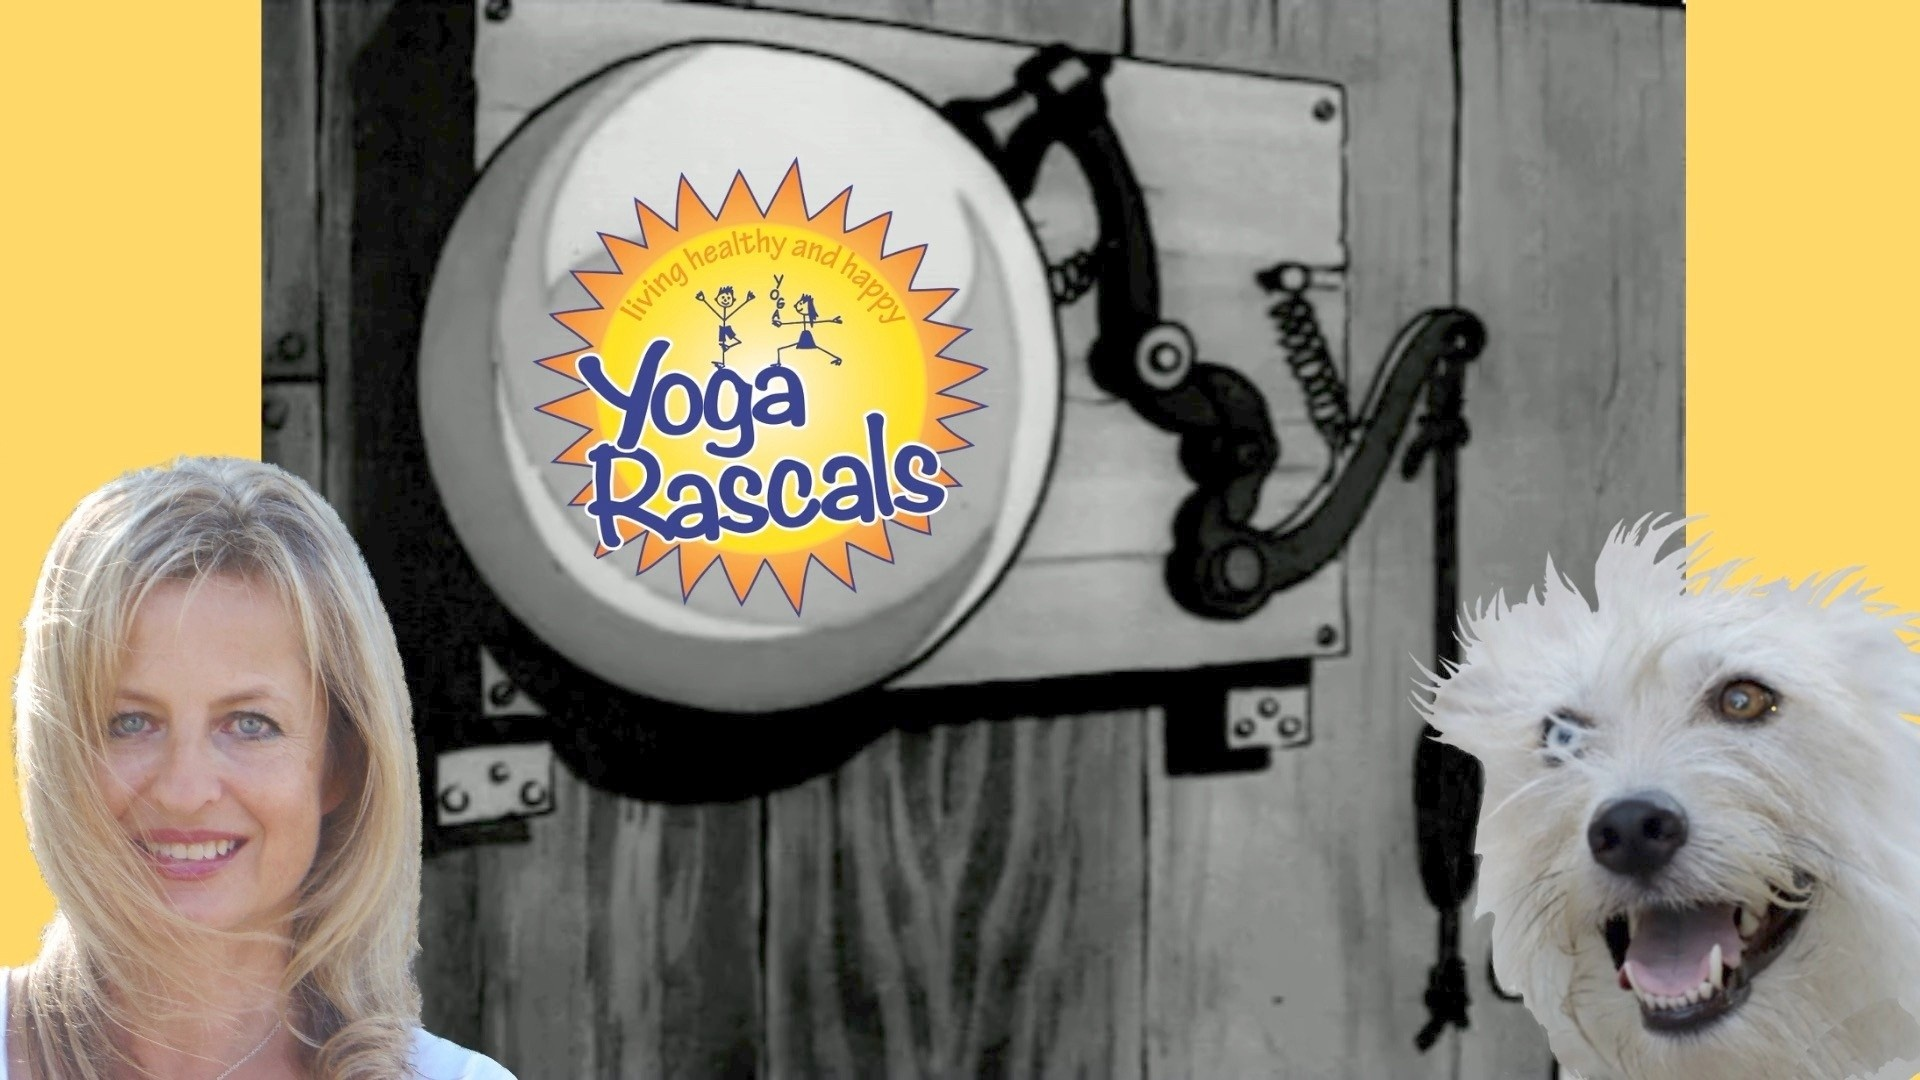 Expert kids yoga instructor Sünje O'Clancy and her dog, Hippie